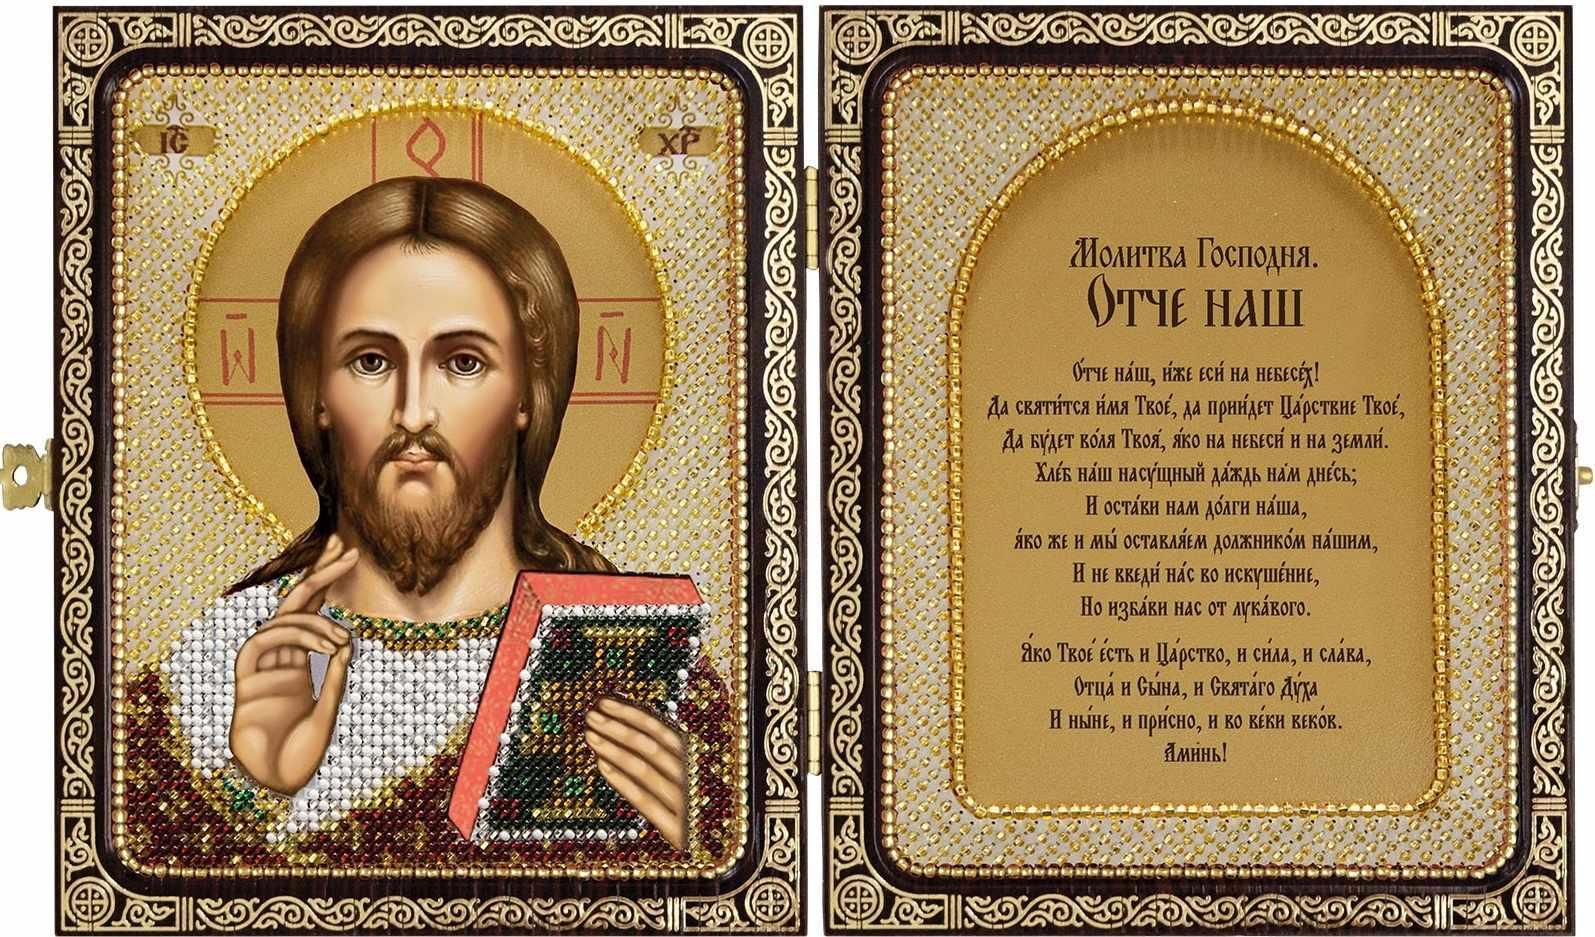 СЕ 7101 Христос Спаситель